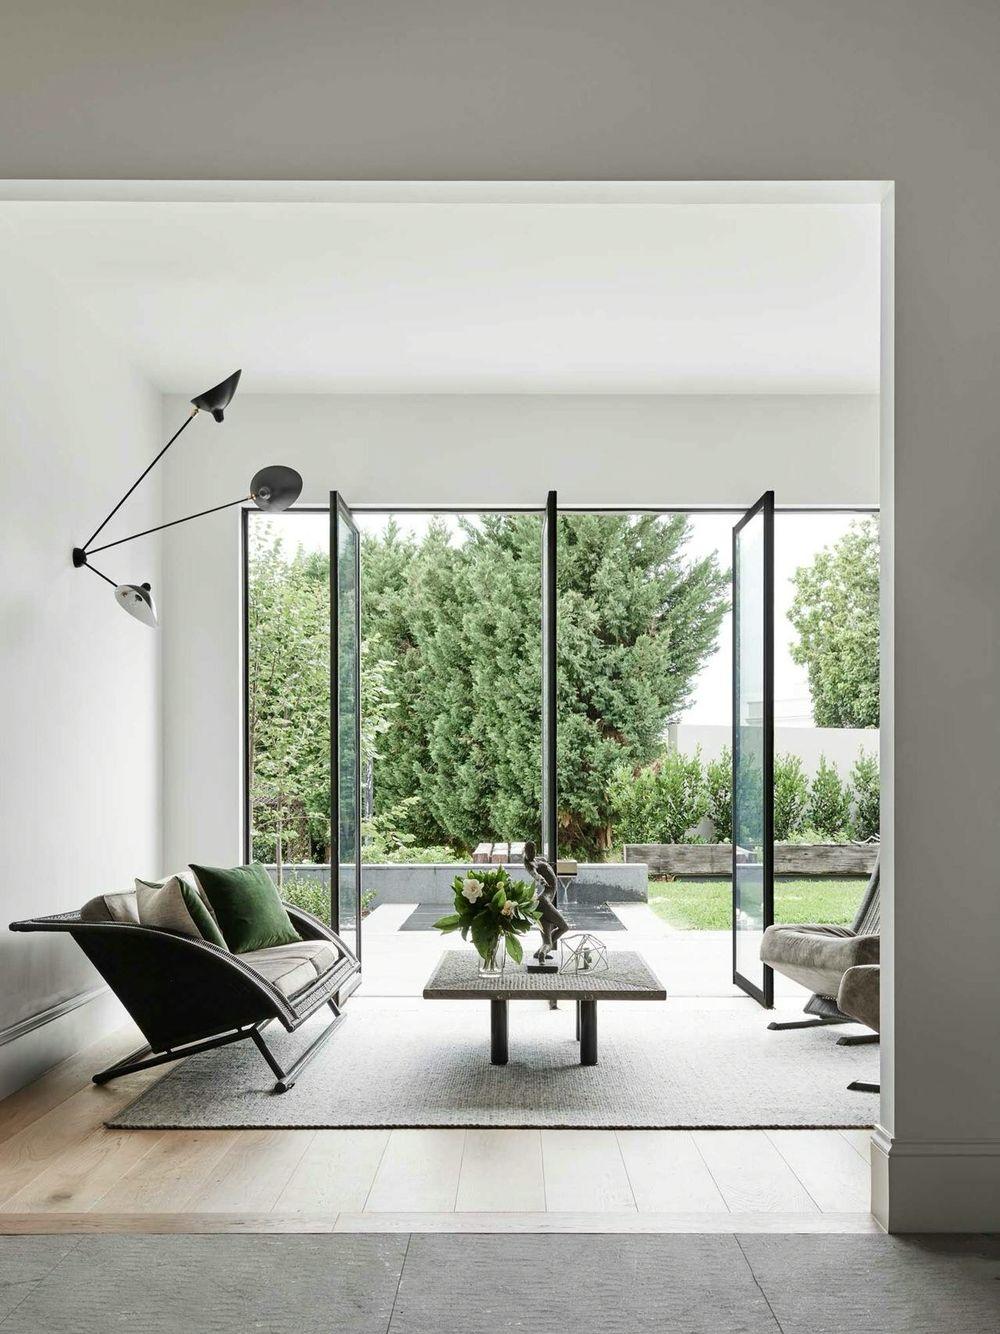 Glass Door Designs For Living Room Fascinating Pinoscar Racso On Interieur & Huisjes  Pinterest  Living Inspiration Design